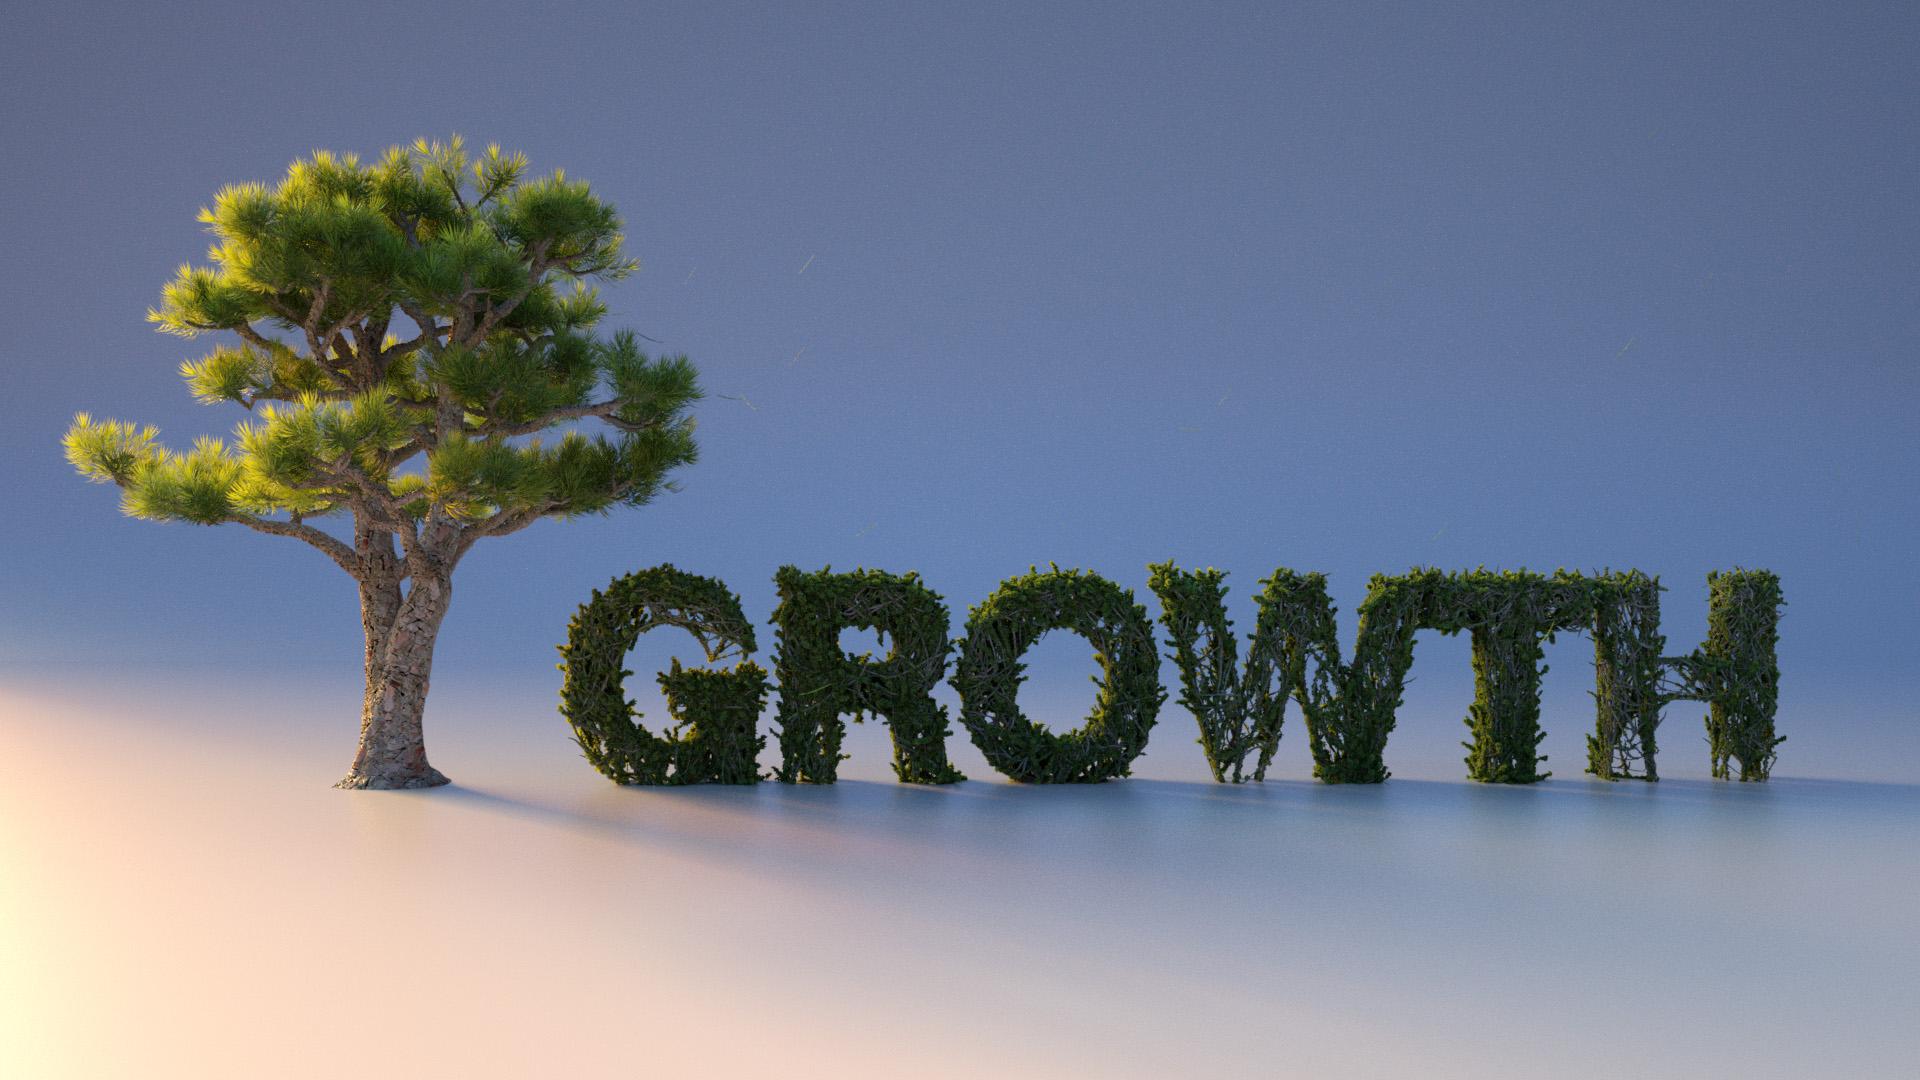 scene01_growth_closeup02 (0-00-09-22).jpg